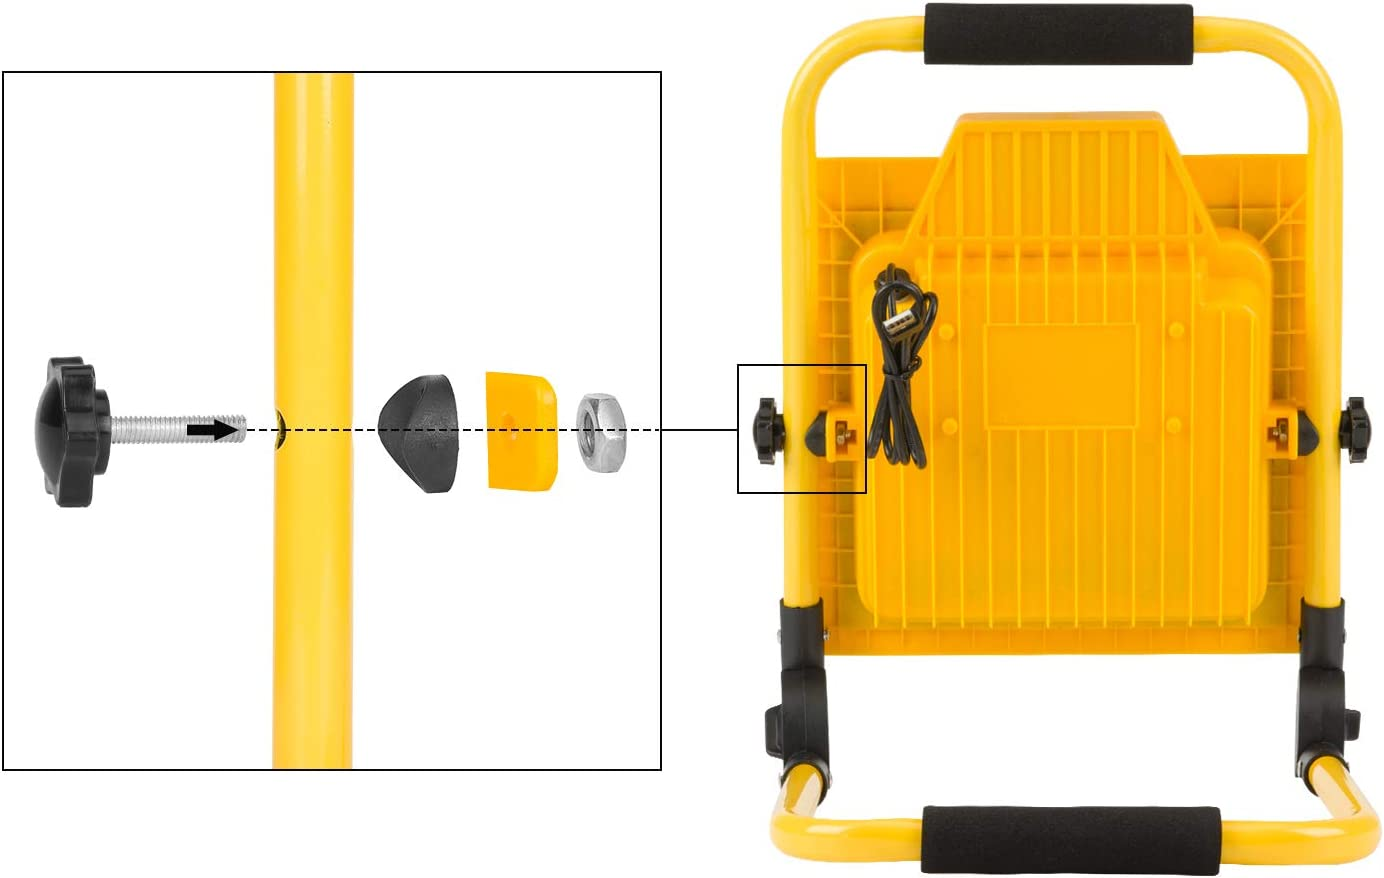 Akku LED Baustrahler Arbeitsleuchte Tragbar 1065 Lm IP65 6500K Tageslichtwei/ß USB Ausgang-Ports 60W LED Strahler